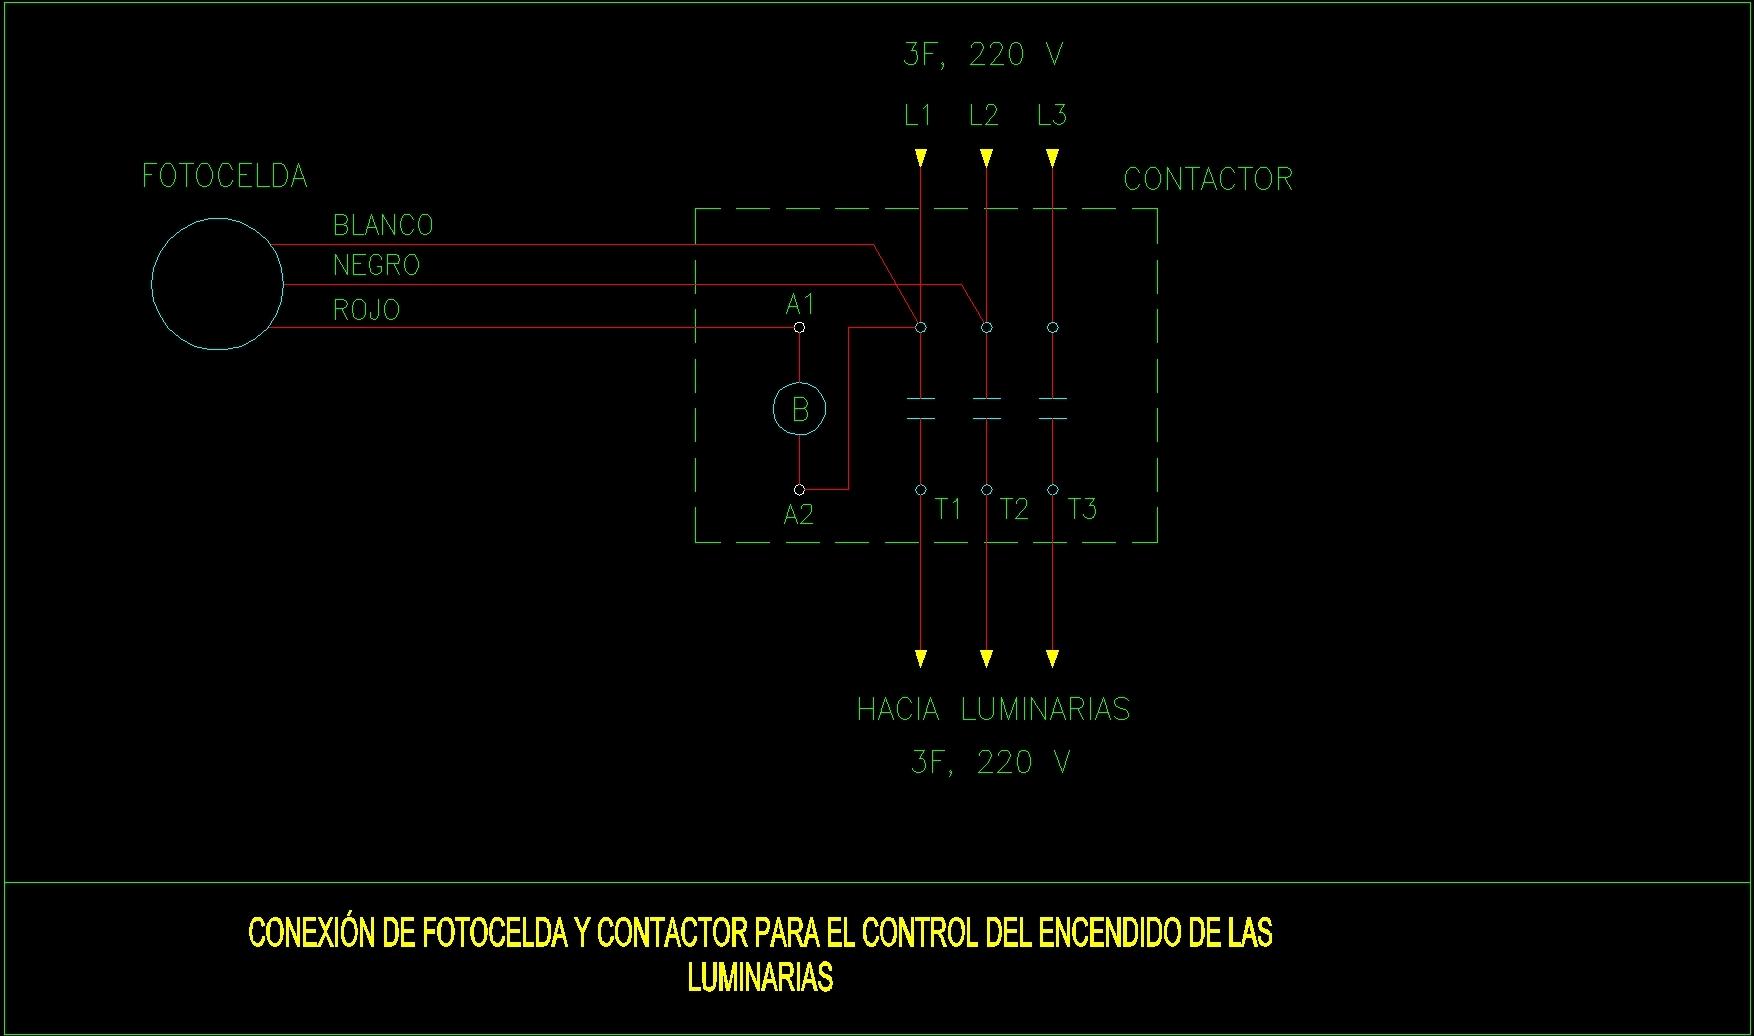 Motor Starter Wiring Schematic Autocad Electrical Diagrams Diagram In Mercury Single Pole Contactor Schematics